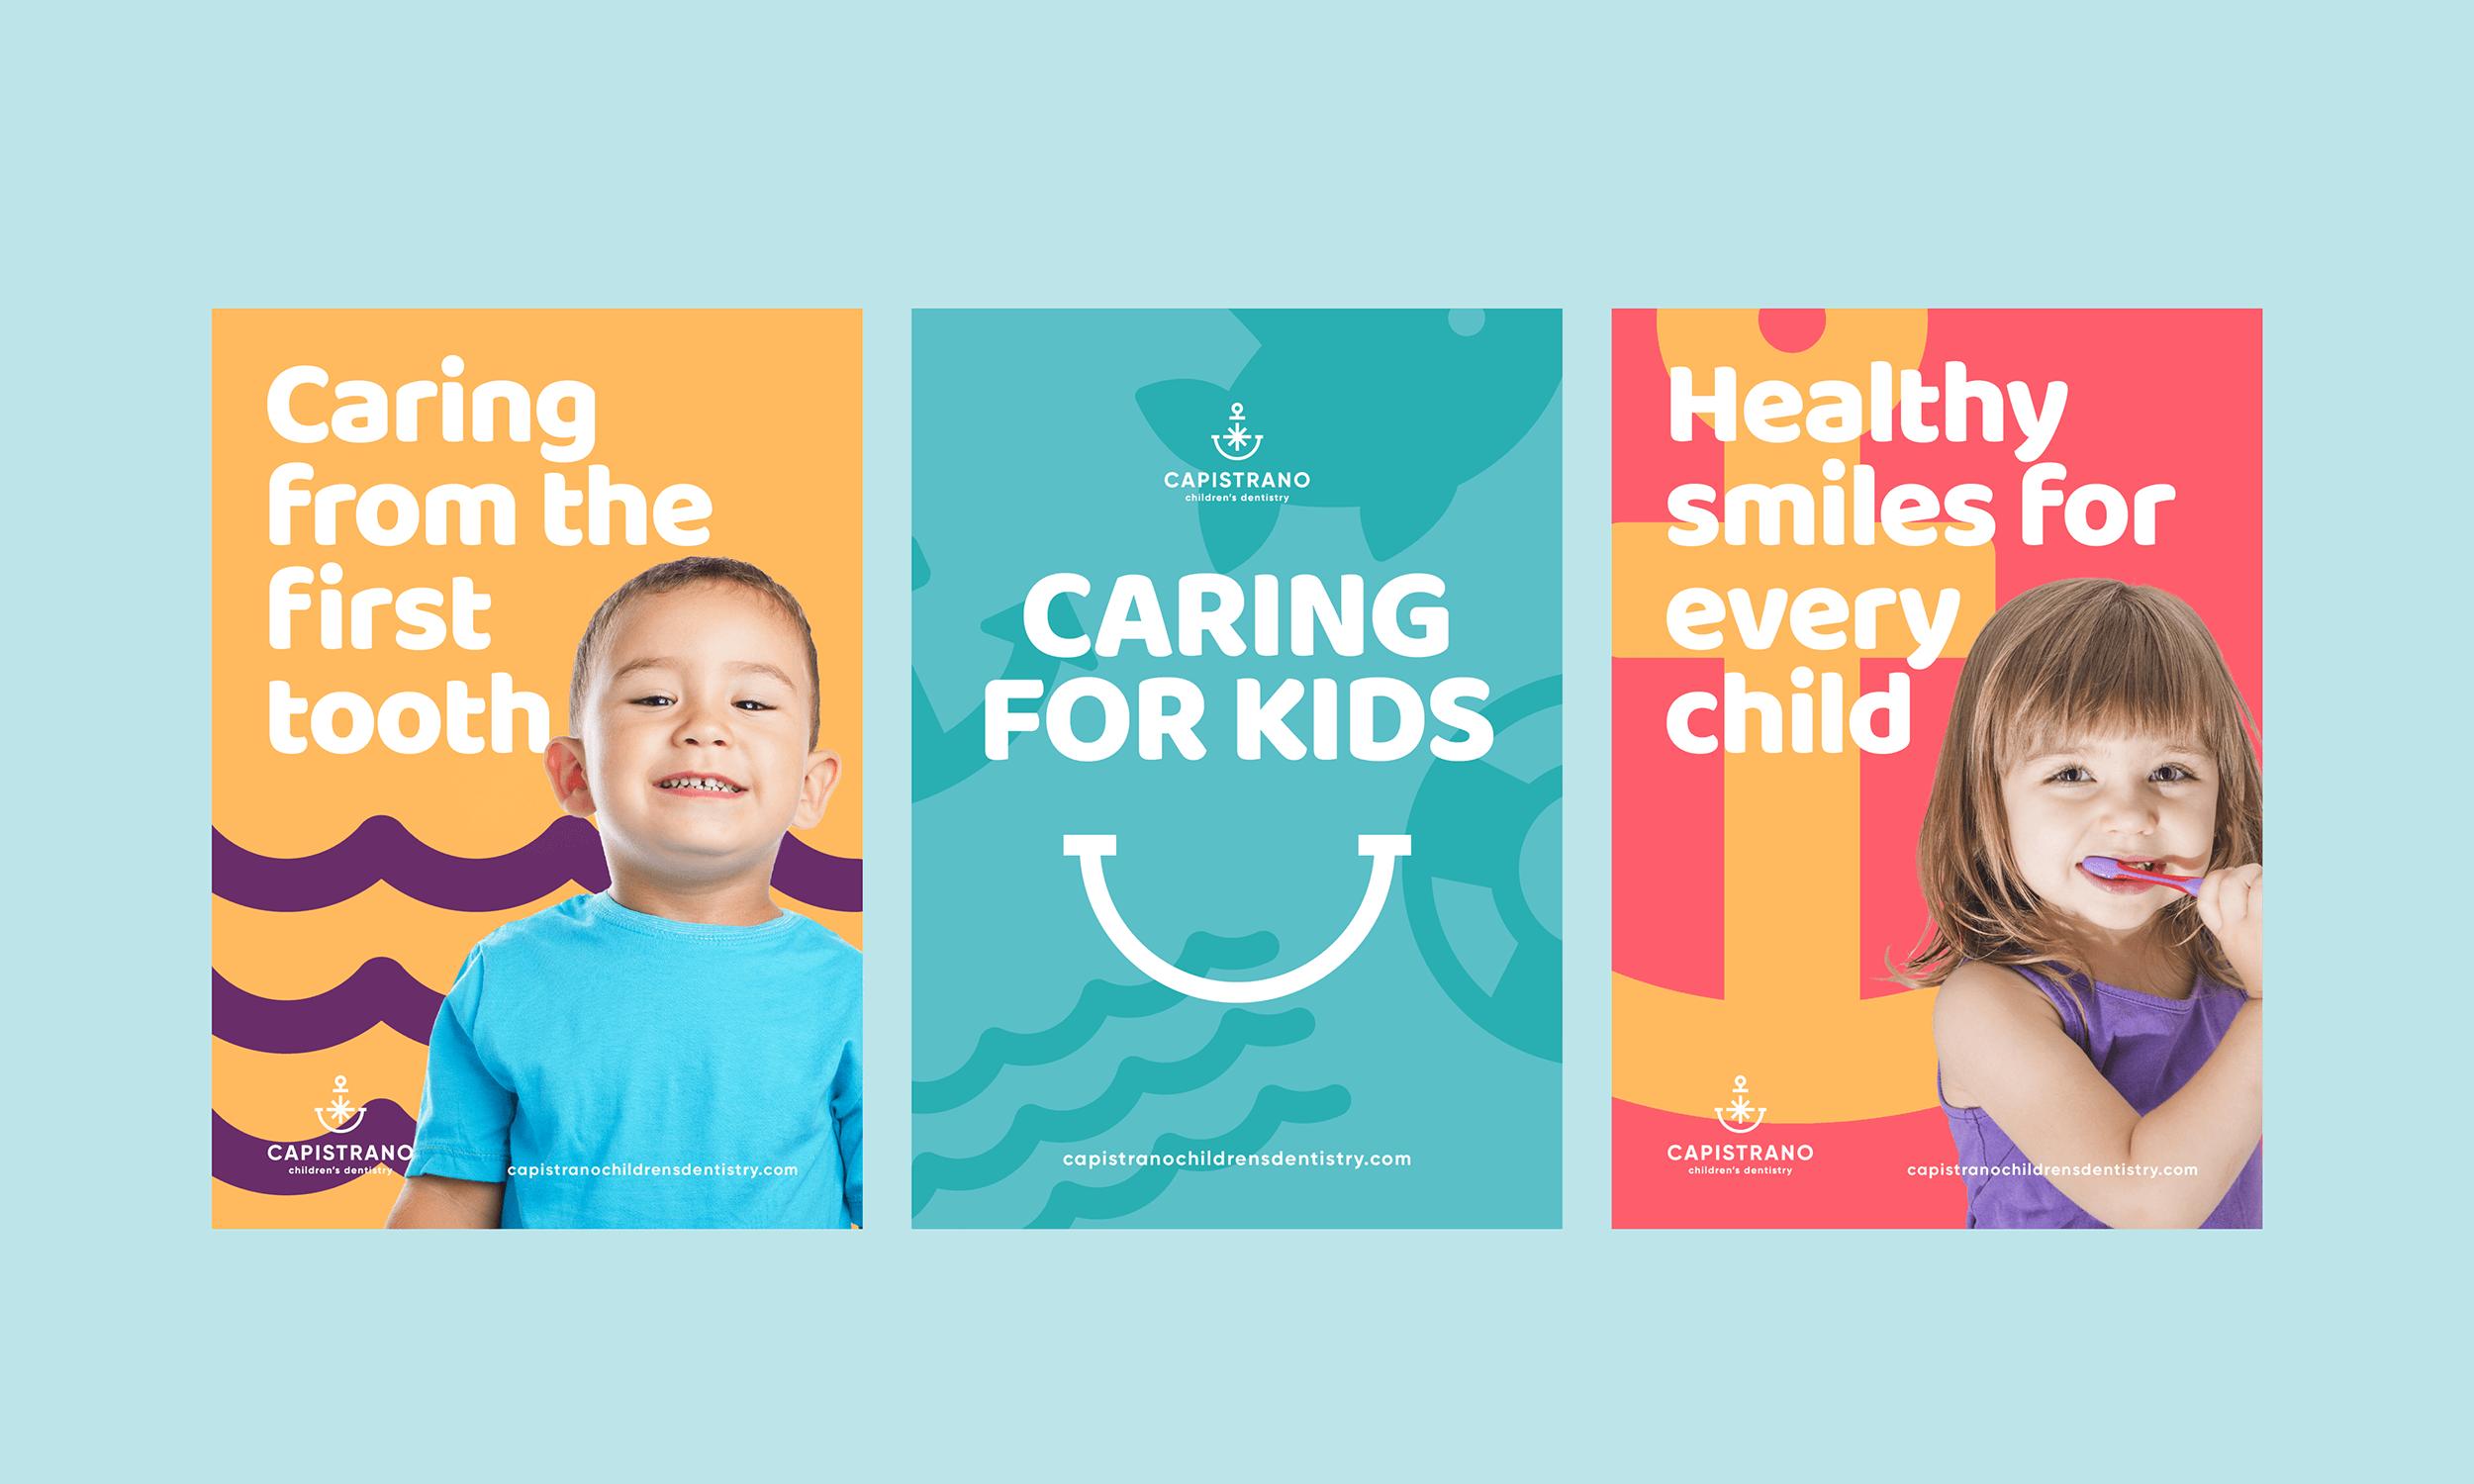 Capistrano-Childrens-Dentistry-Logo-Design-Freelance-Graphic-Designer-Margate-Kent-Presentation-Pediatric-Dental-Posters